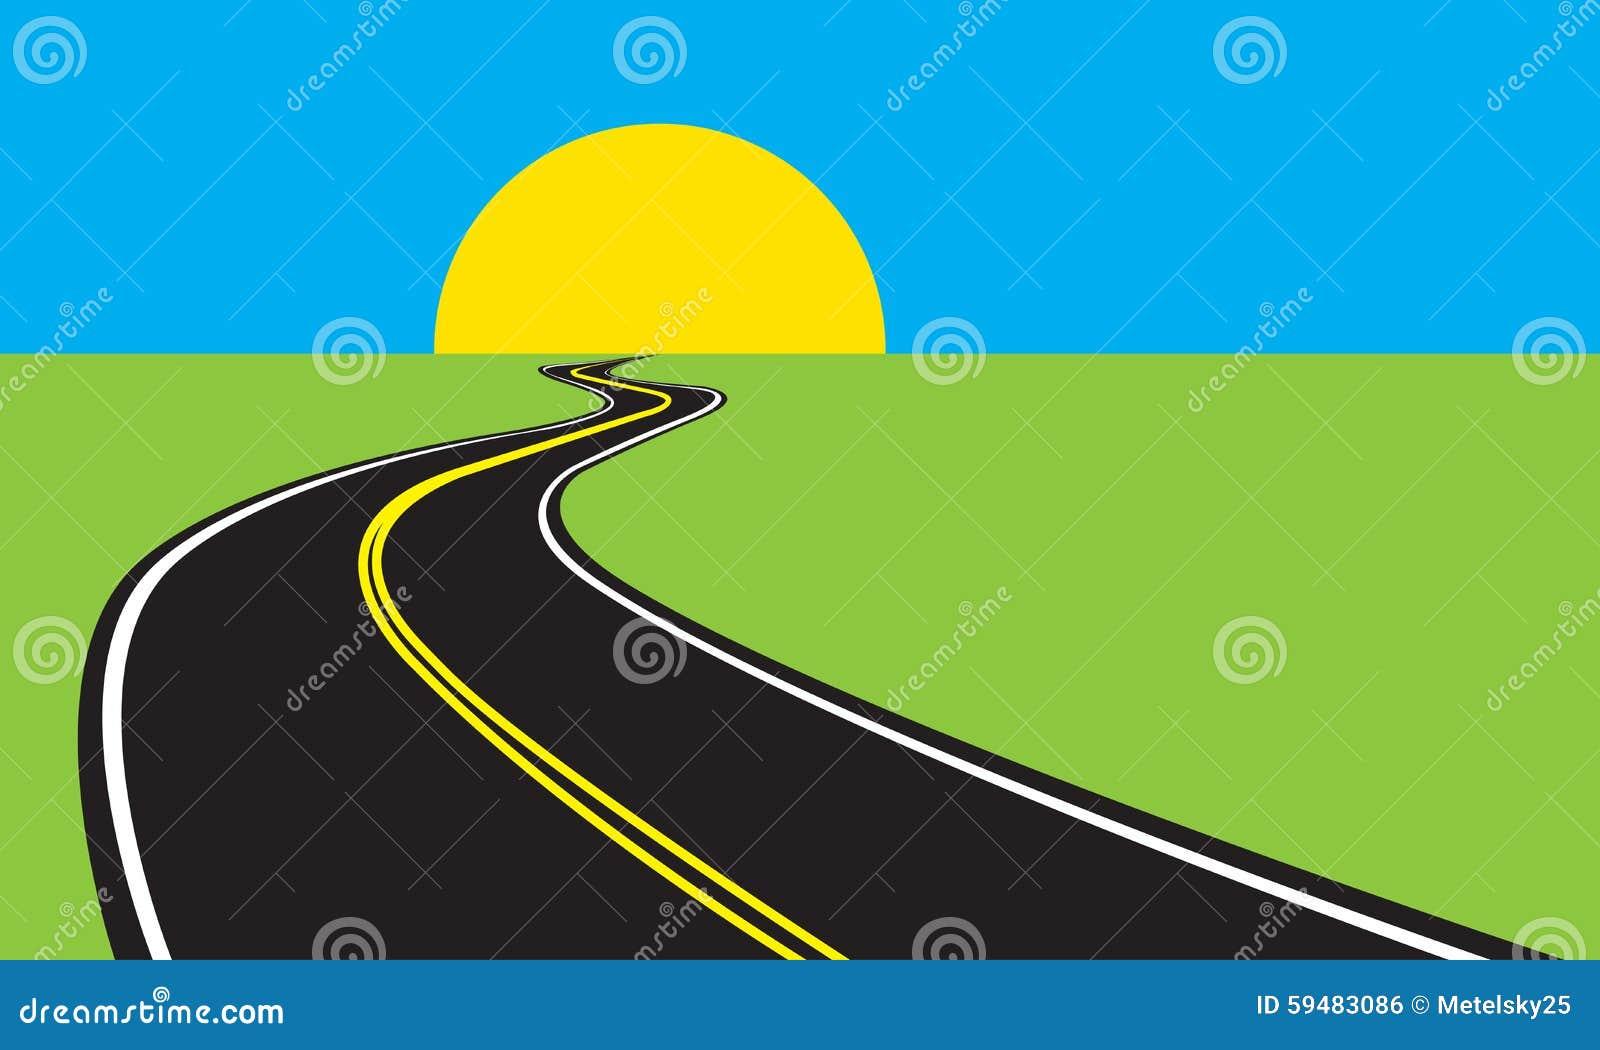 Asphalt Winding Road And Green Landscape Vector